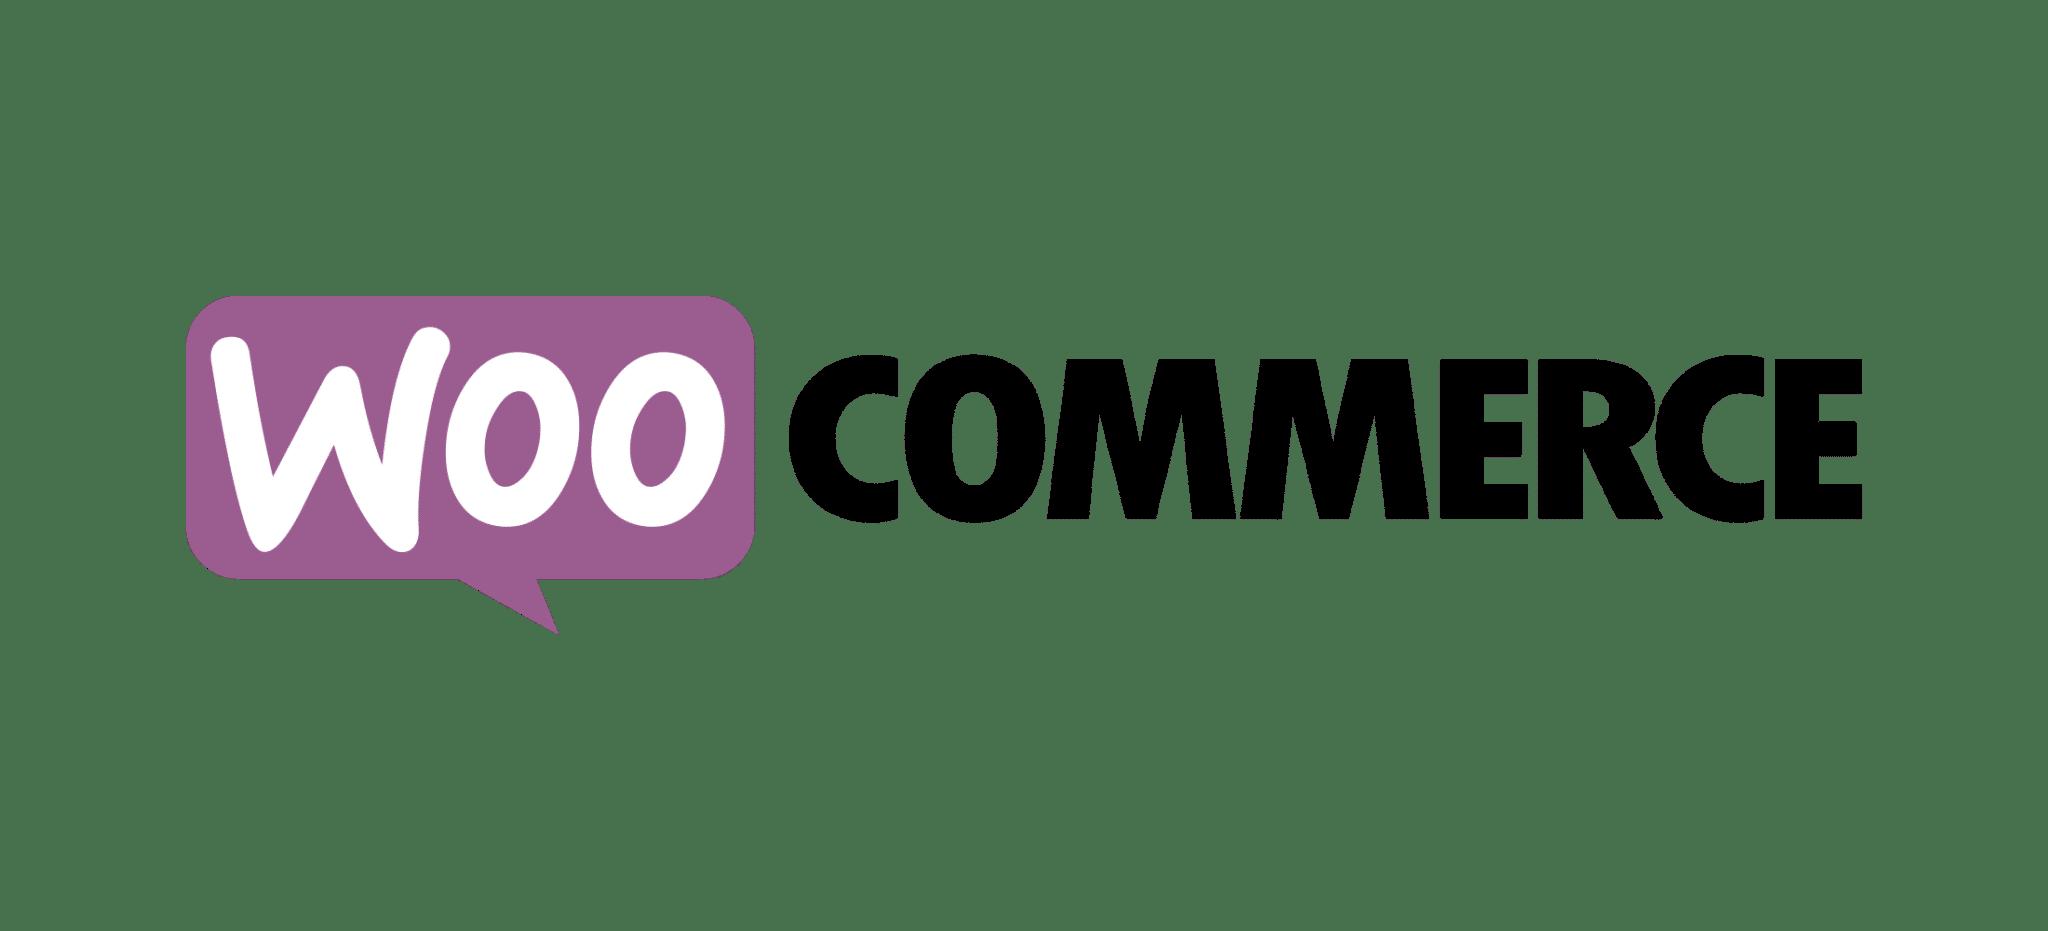 WooCommerce Logo - Bear North ECommerce